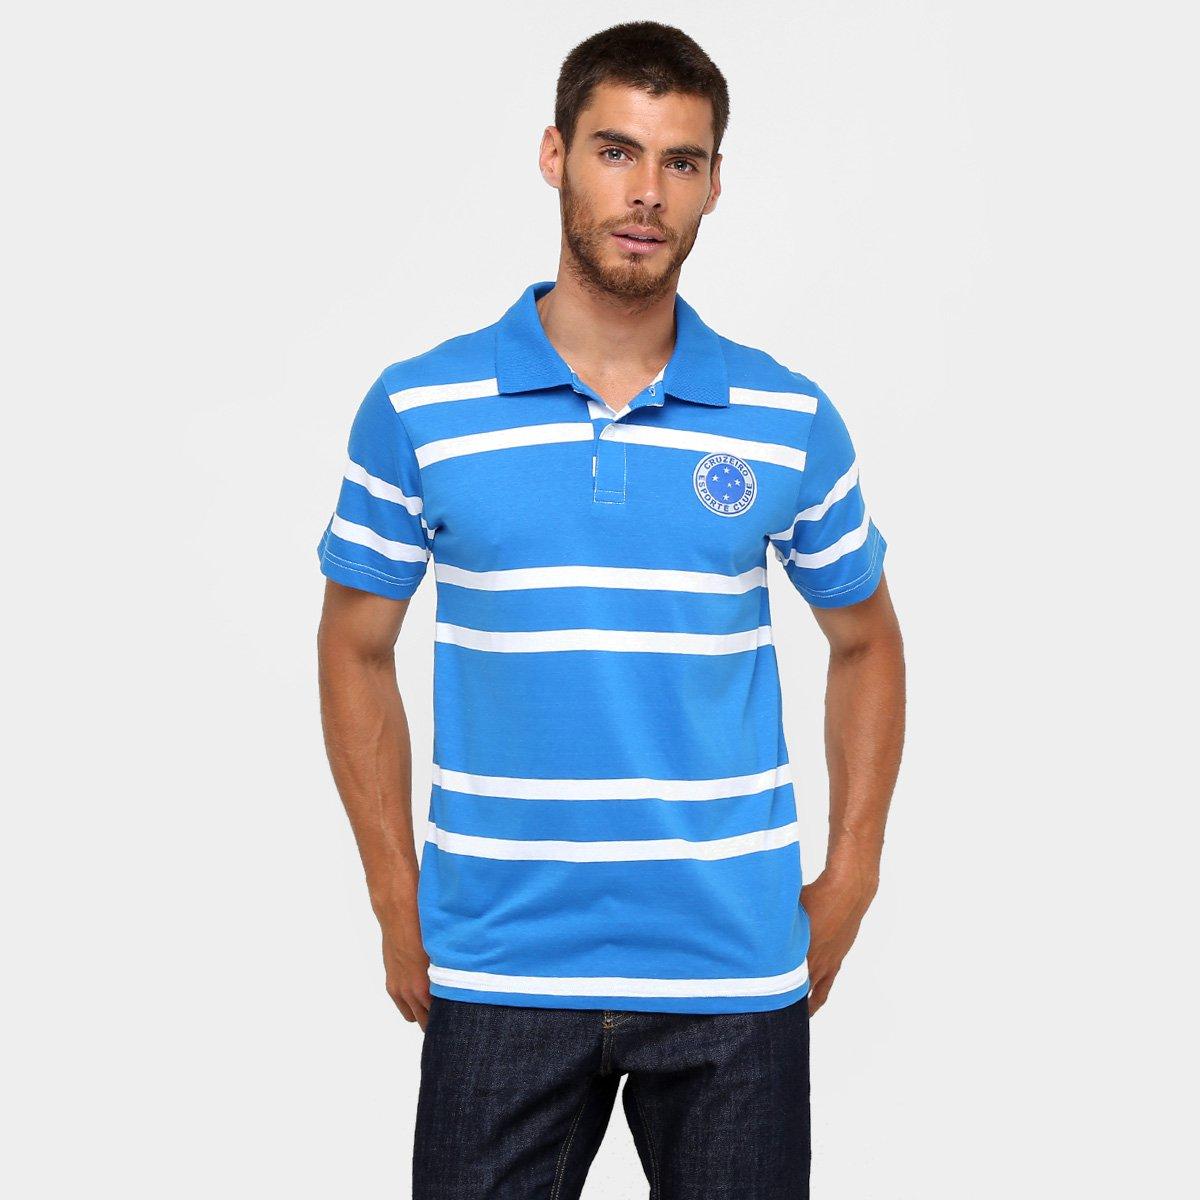 Camisa Polo Cruzeiro Hannigan Masculina - Compre Agora  0c31518824a8f